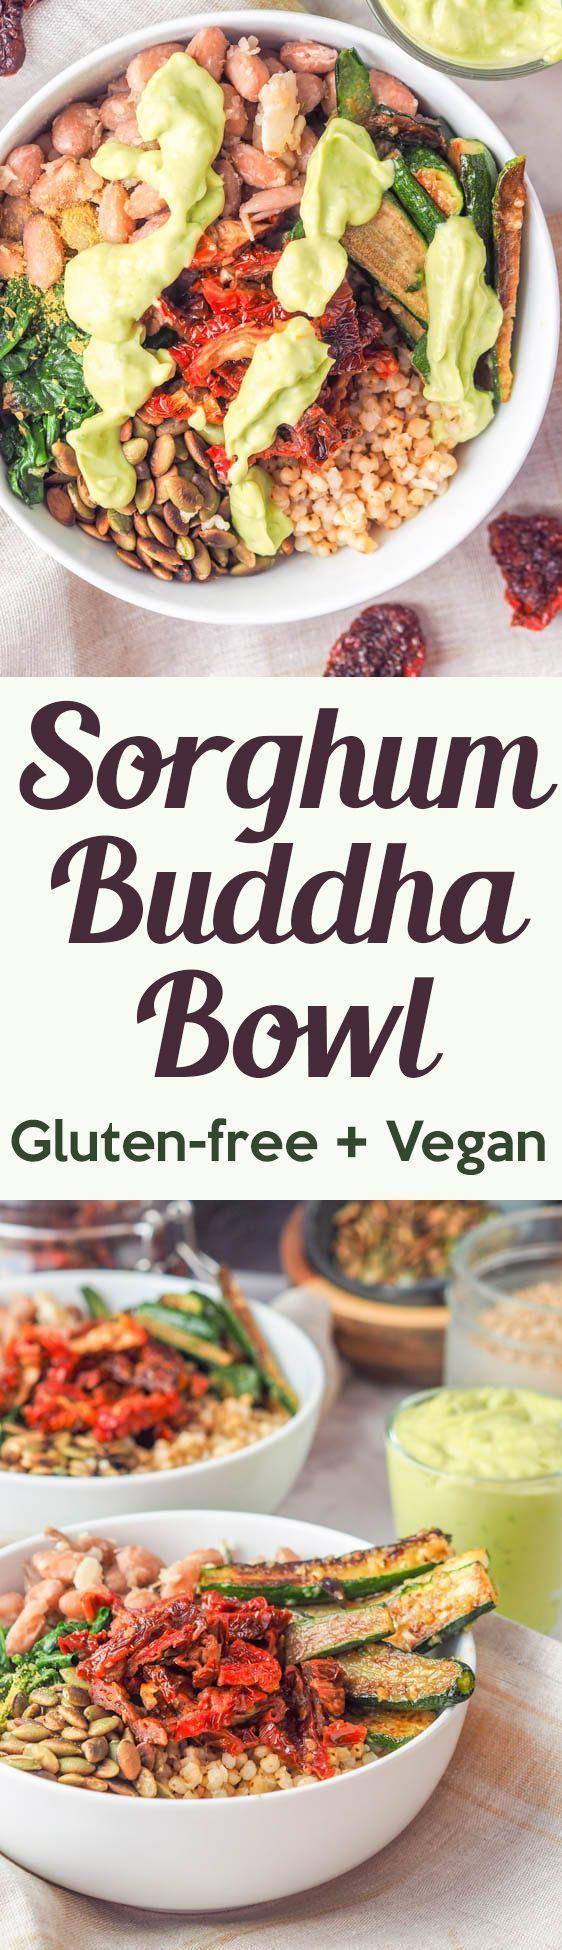 Sorghum Buddha Bowl with Veggies and Avocado Sauce (GF, Vegan)